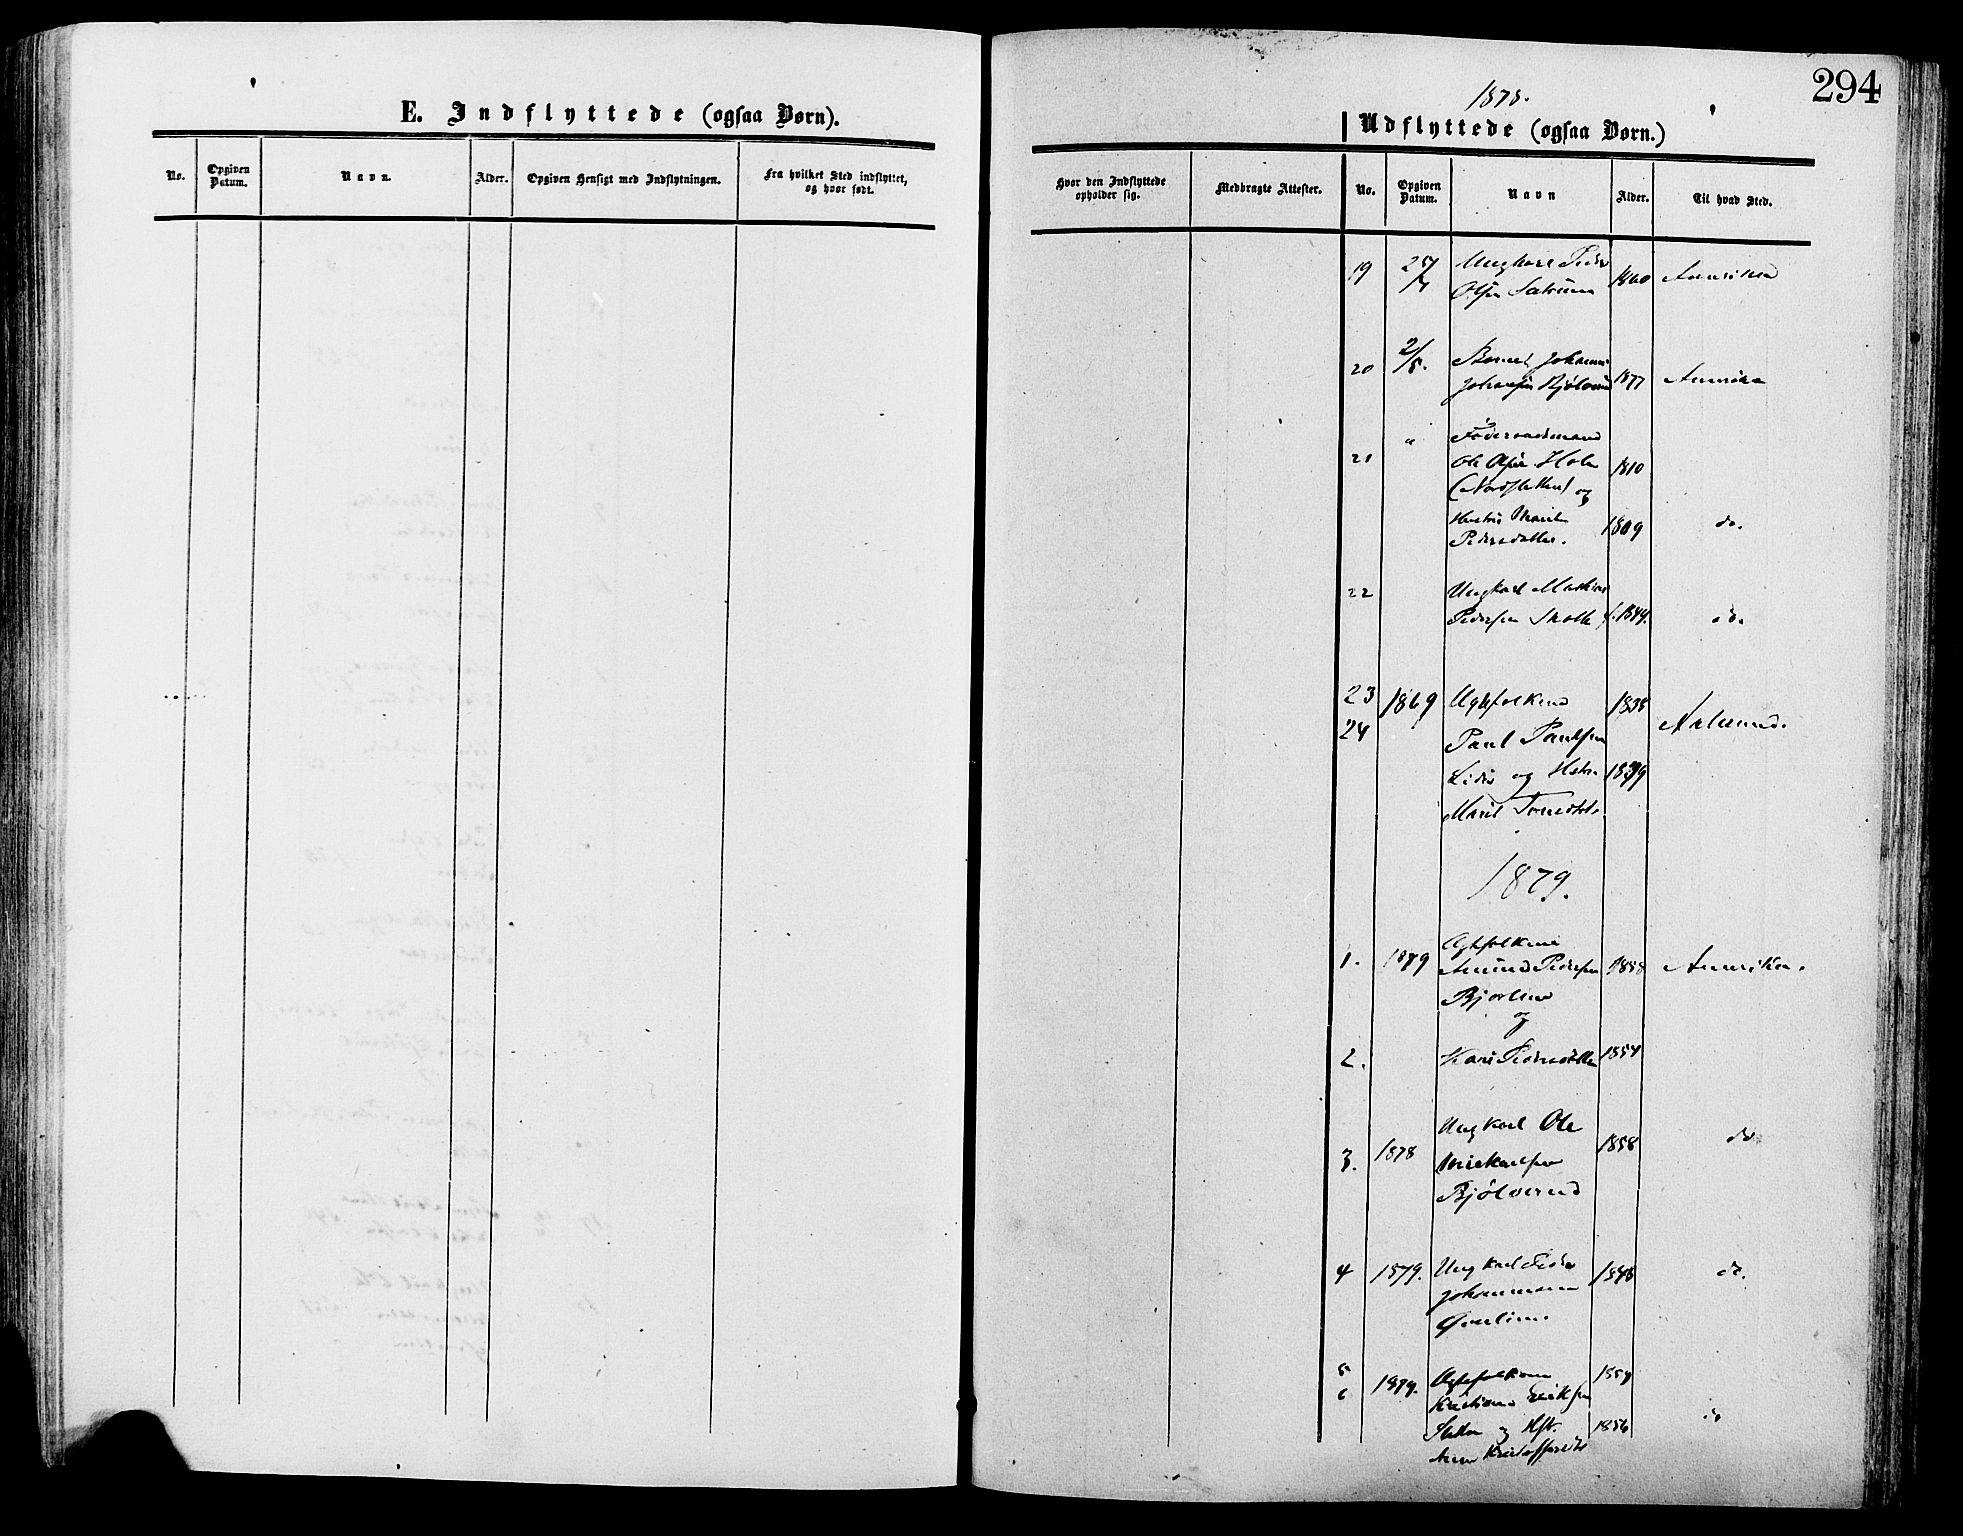 SAH, Lesja prestekontor, Ministerialbok nr. 9, 1854-1889, s. 294